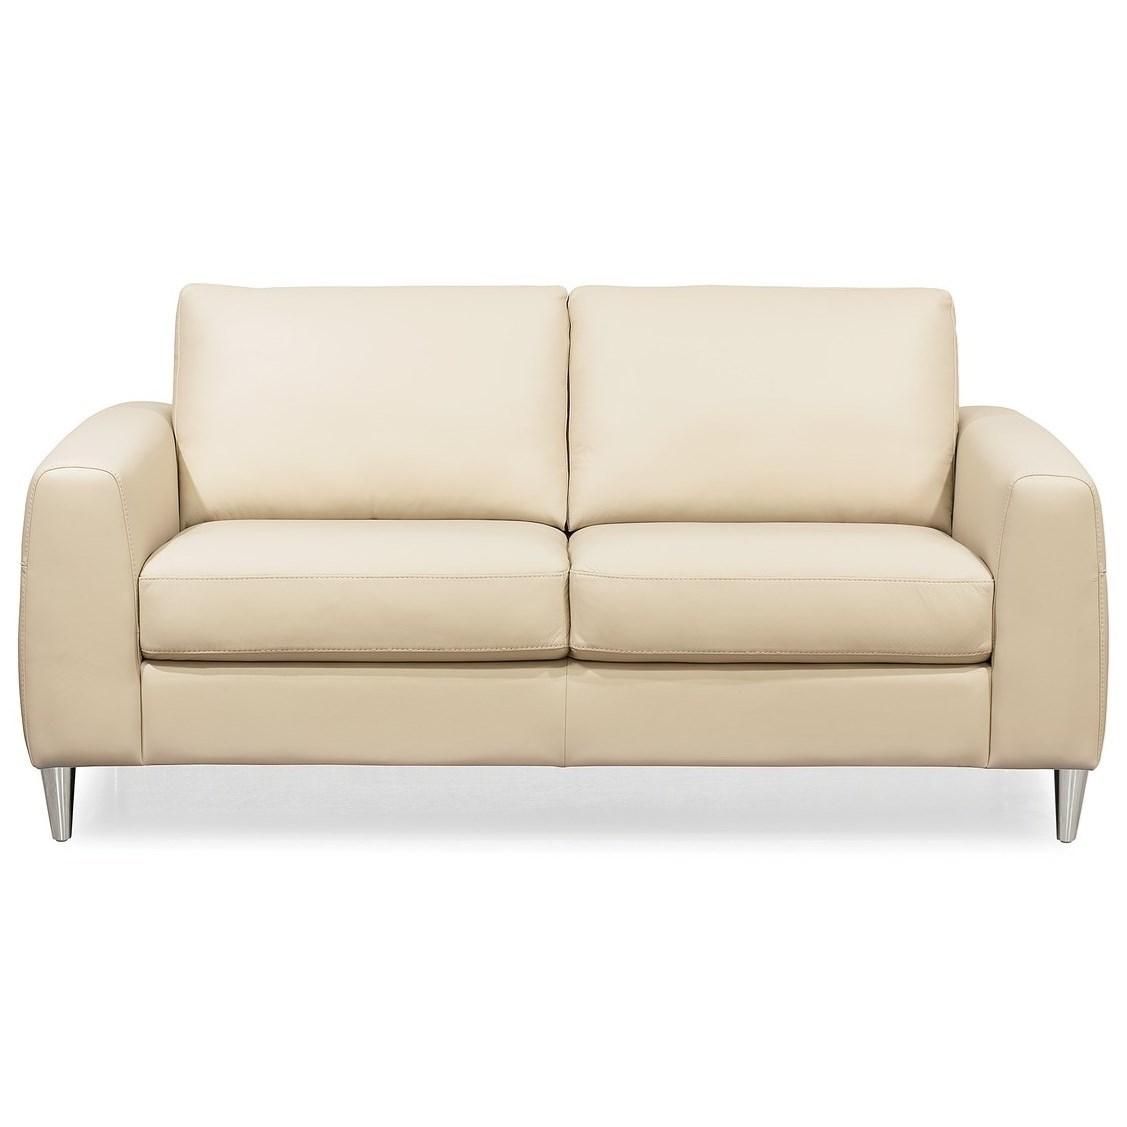 Atticus Love Seat by Palliser at A1 Furniture & Mattress